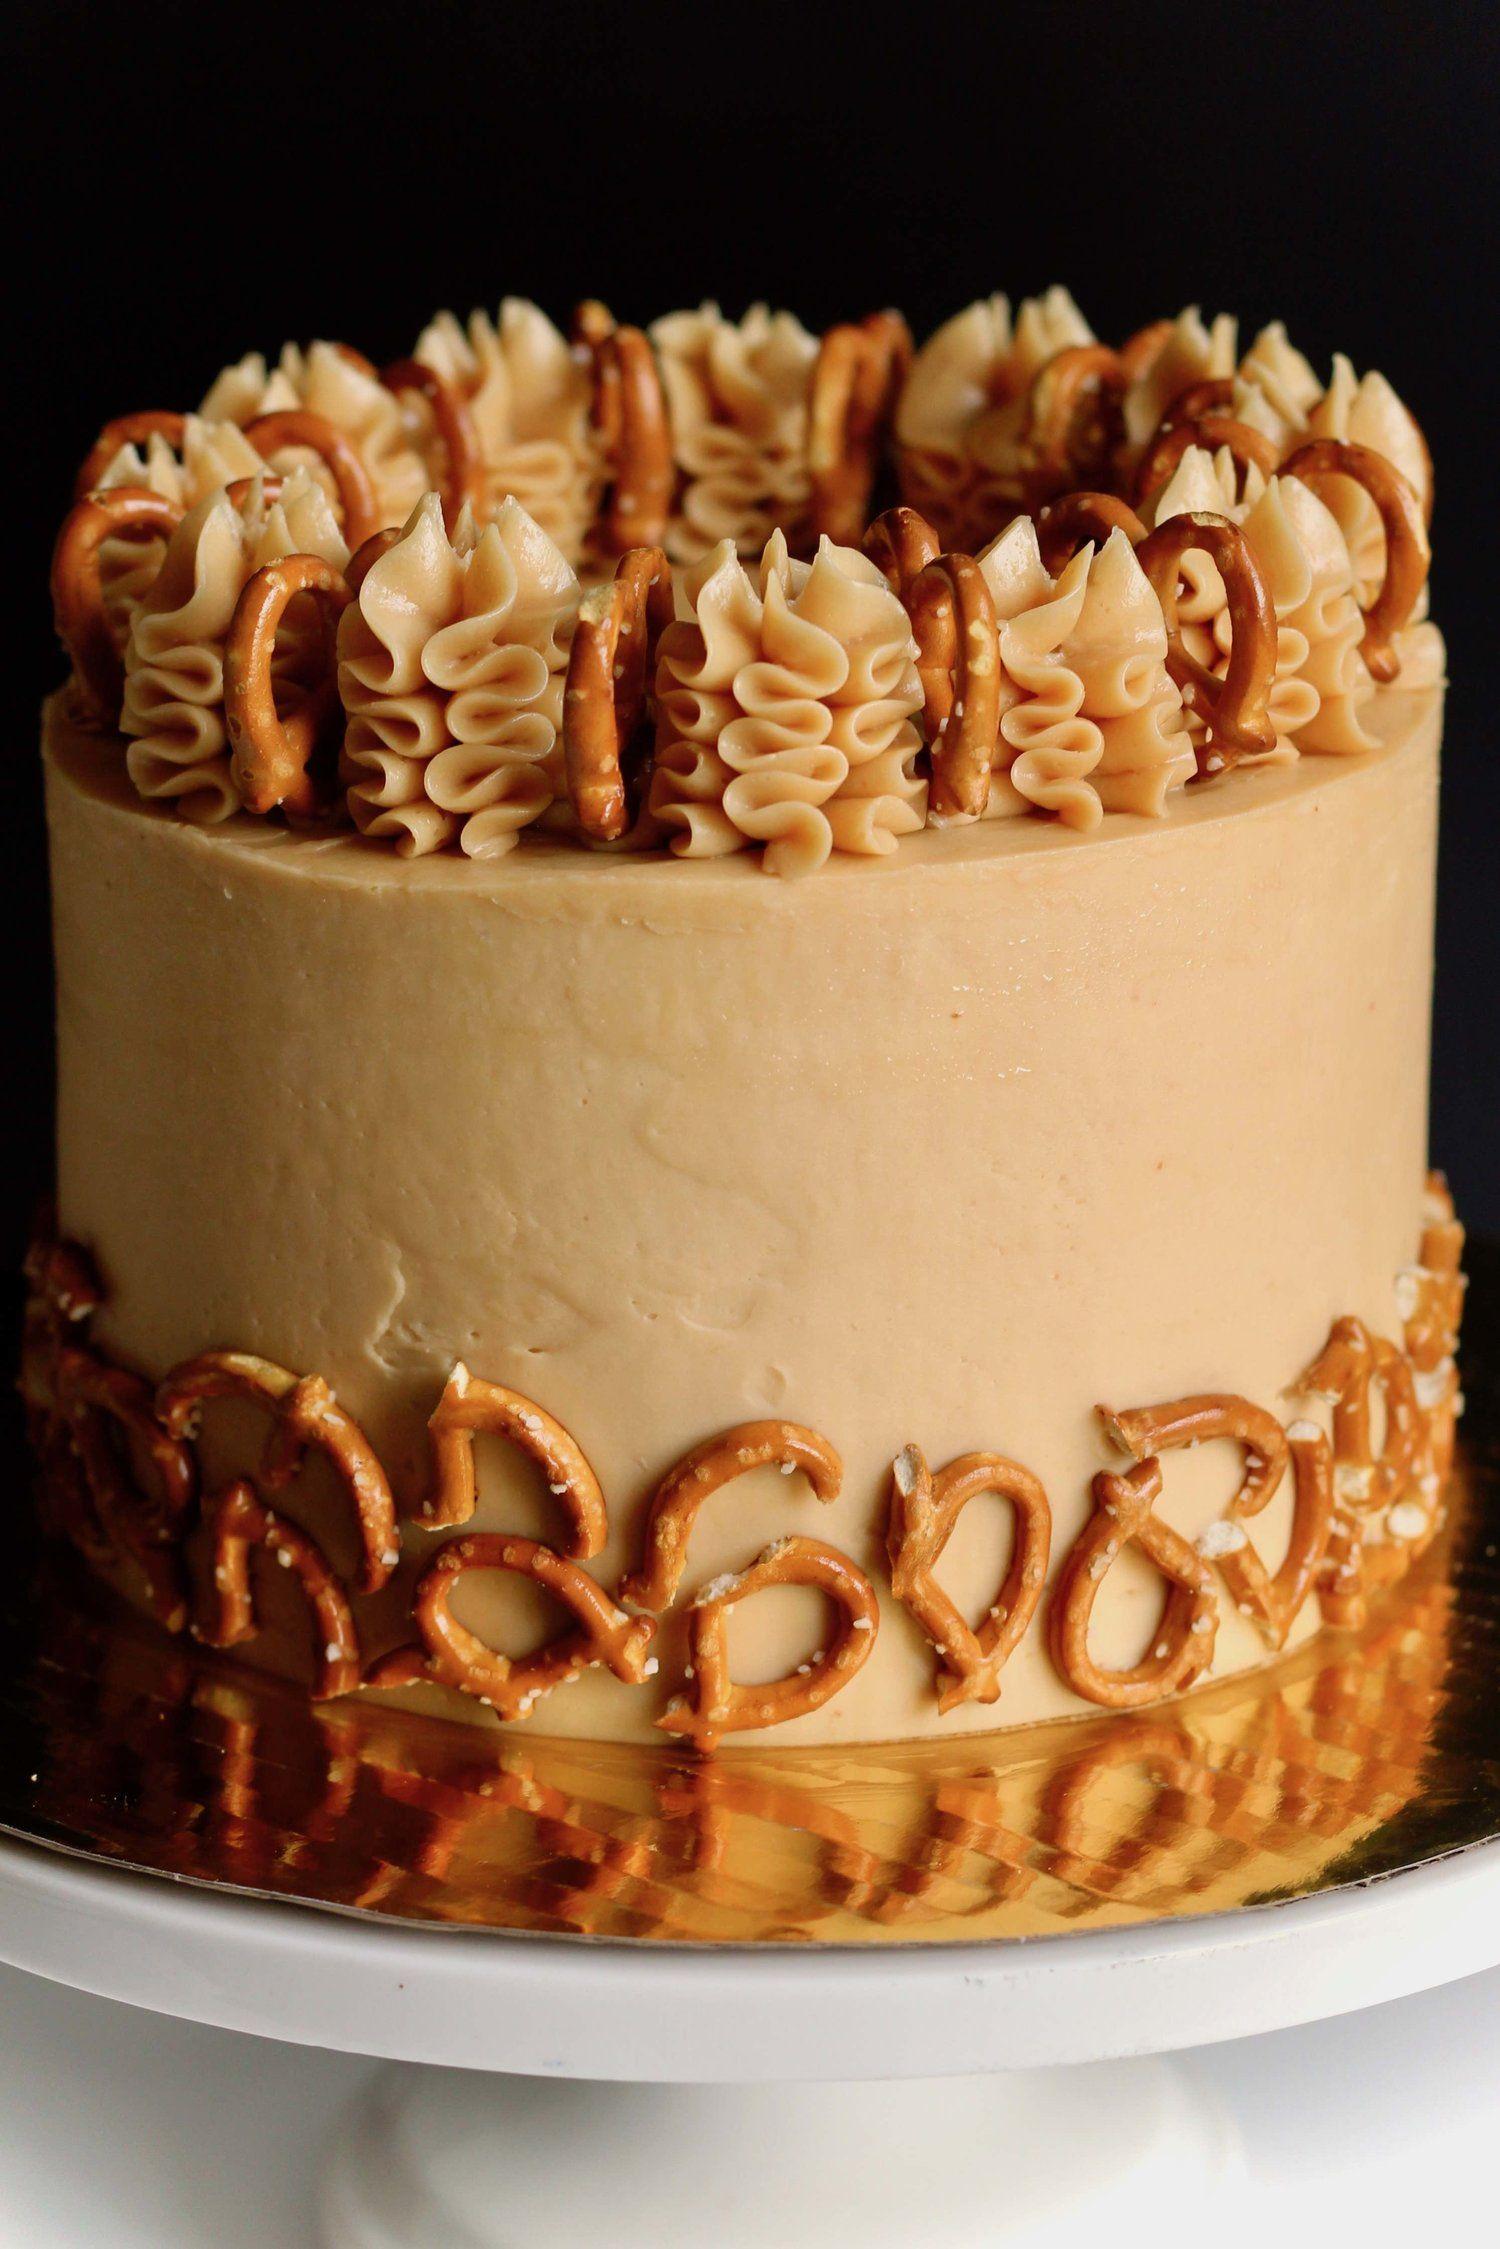 Banana caramel cake betsy bakes caramel cake caramel